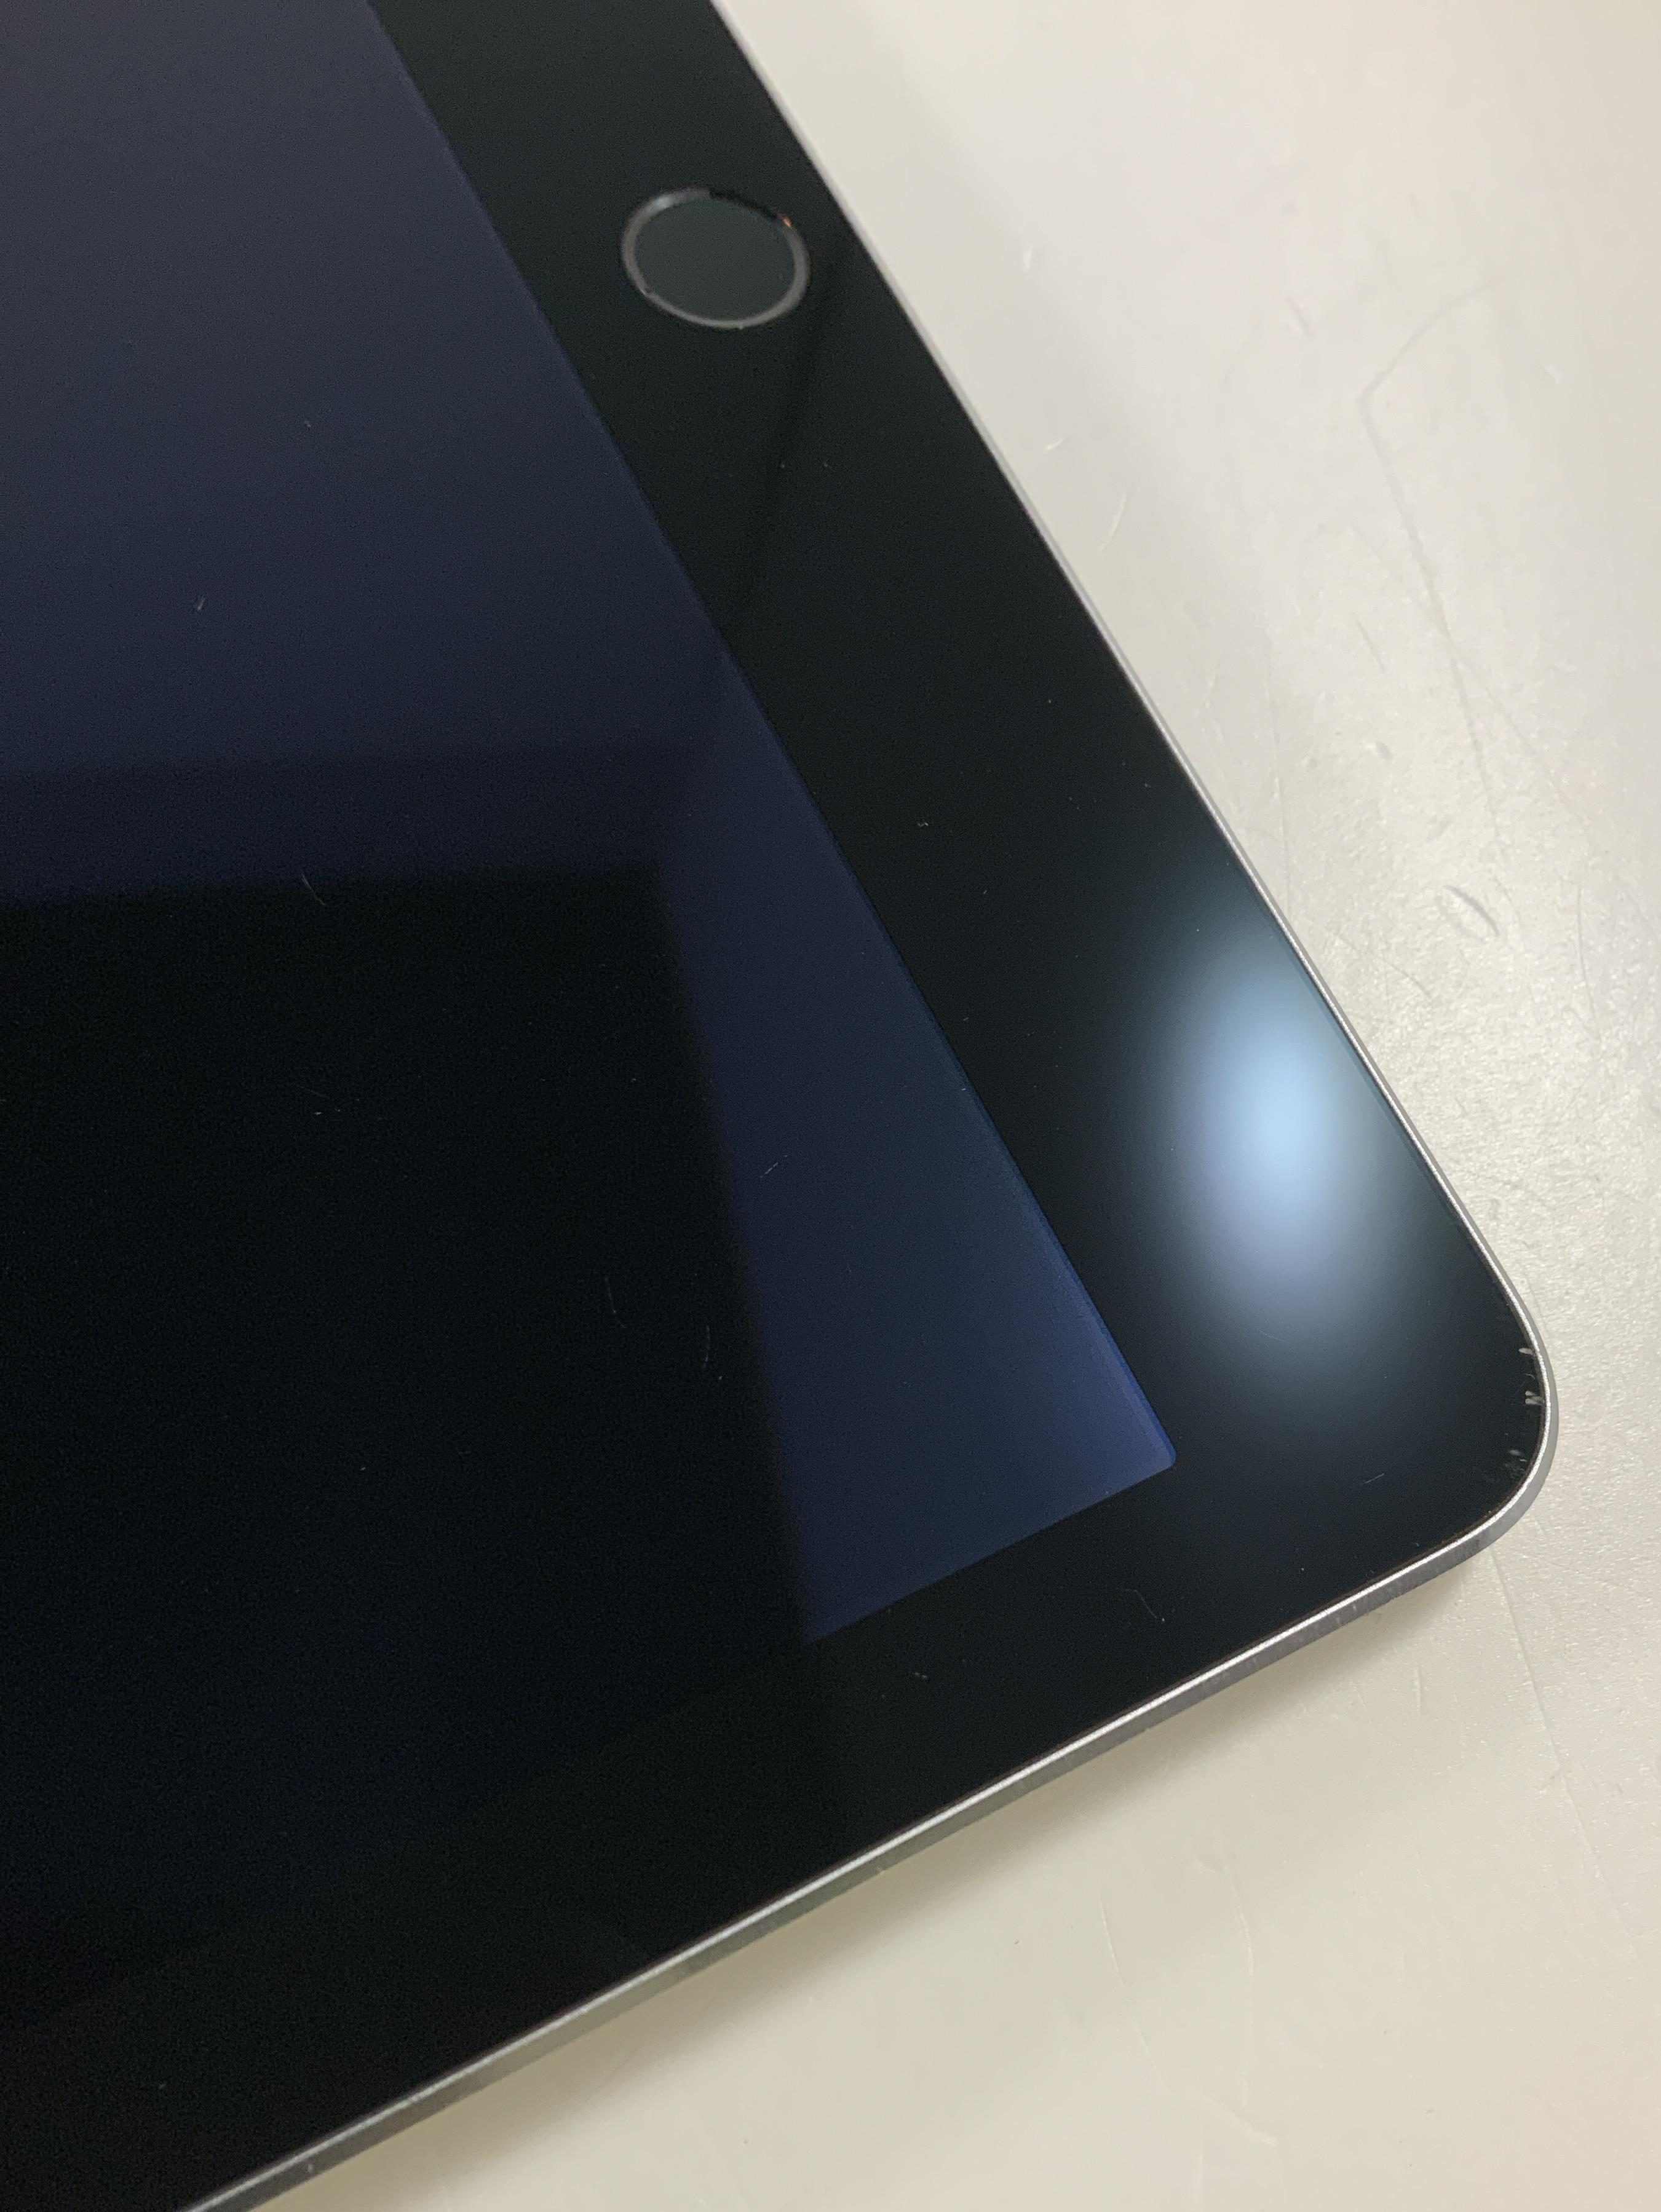 iPad Air 2 Wi-Fi + Cellular 32GB, 32GB, Space Gray, image 3